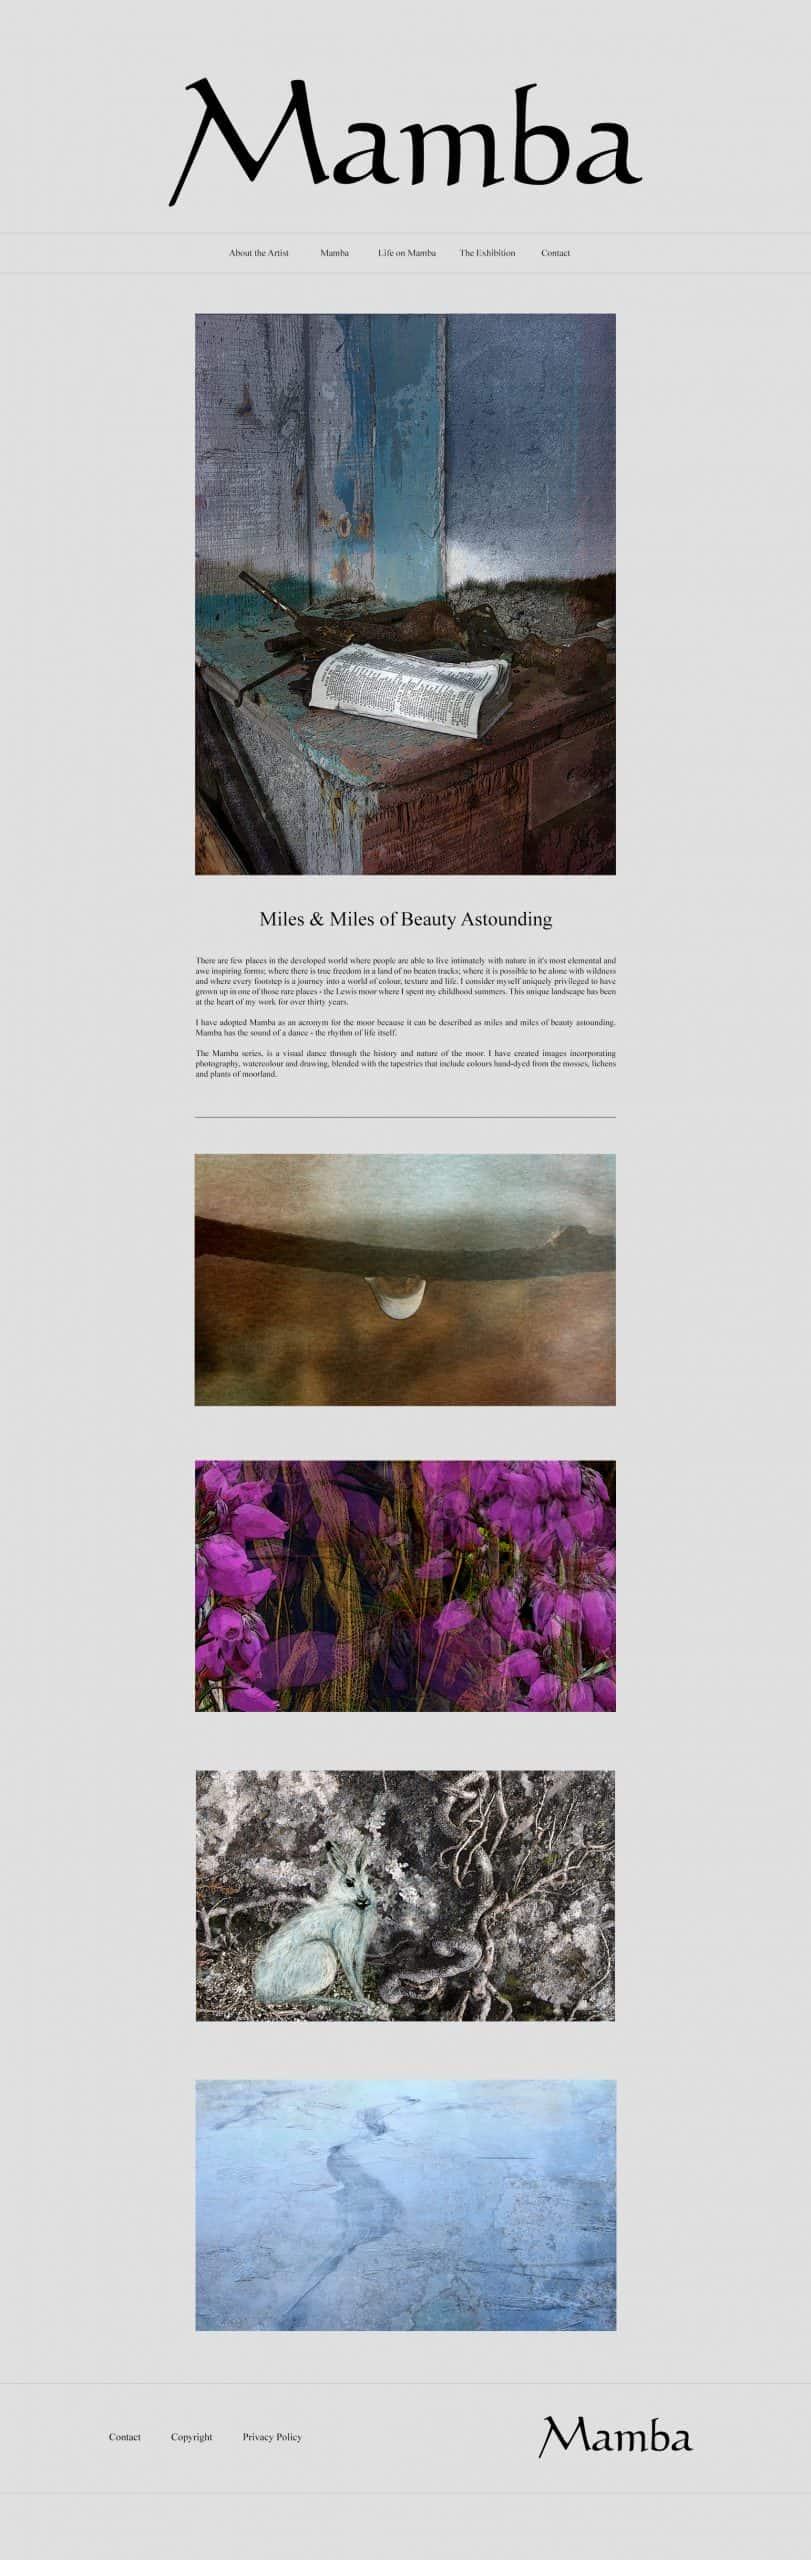 Website Design by Jade Starmore